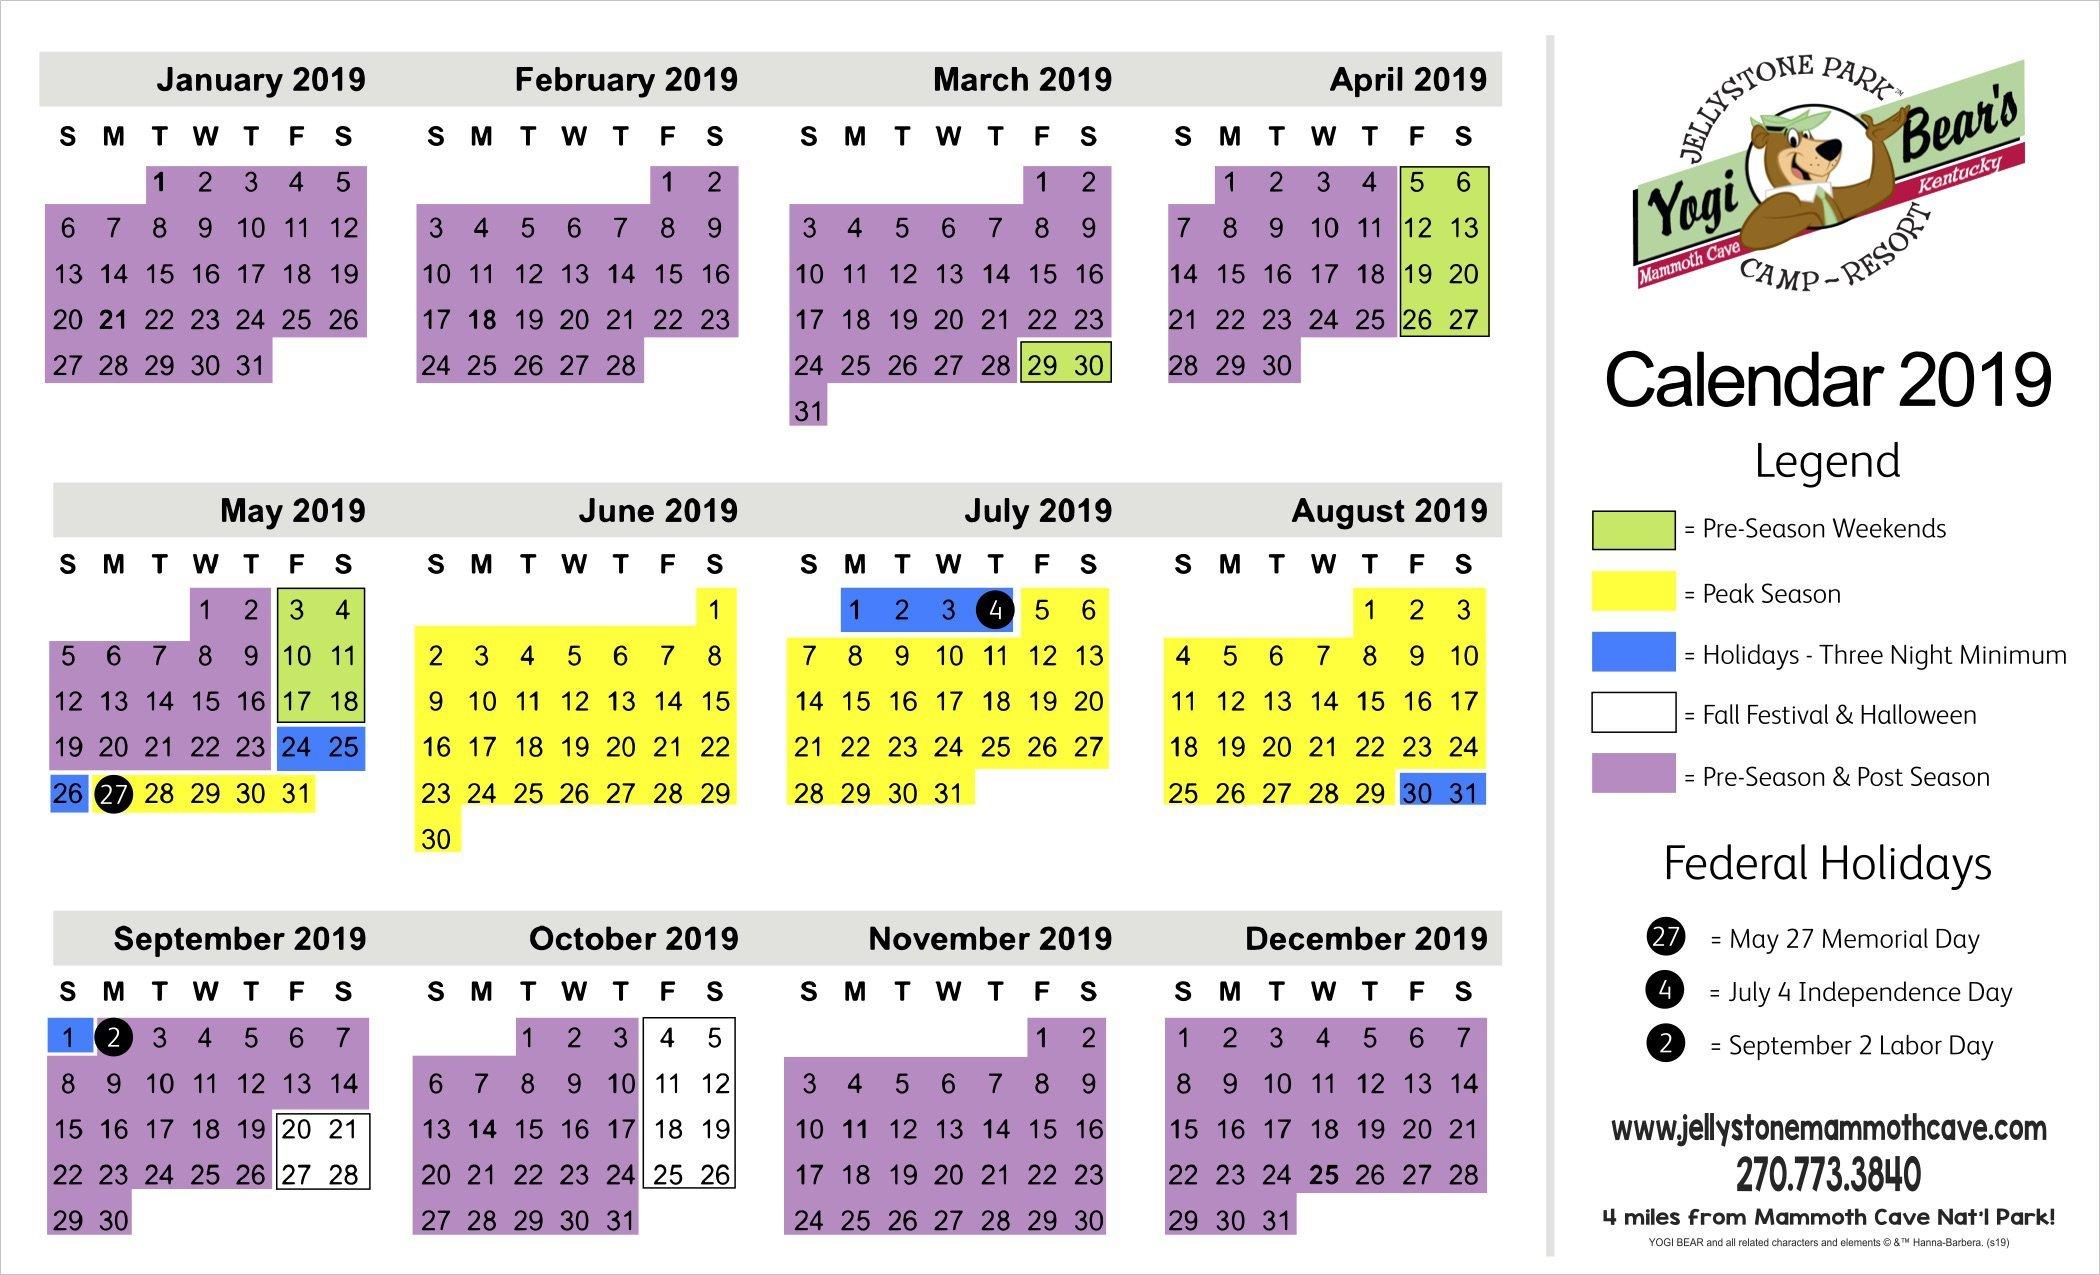 Rates - Jellystone Mammoth Cave Calendar 2019 Rates